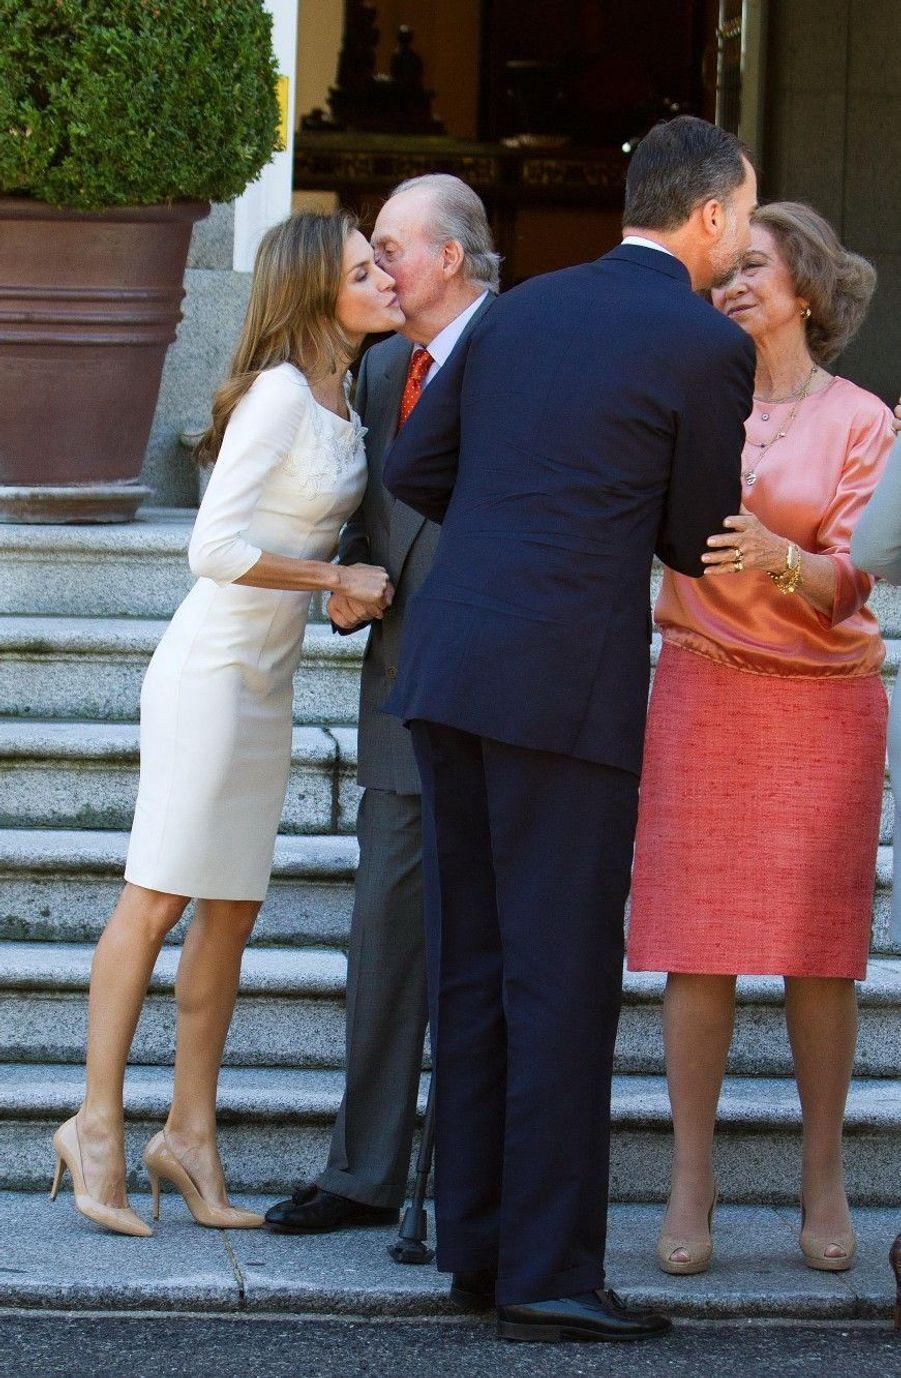 Maxima et Willem-Alexander, visite royale en Espagne